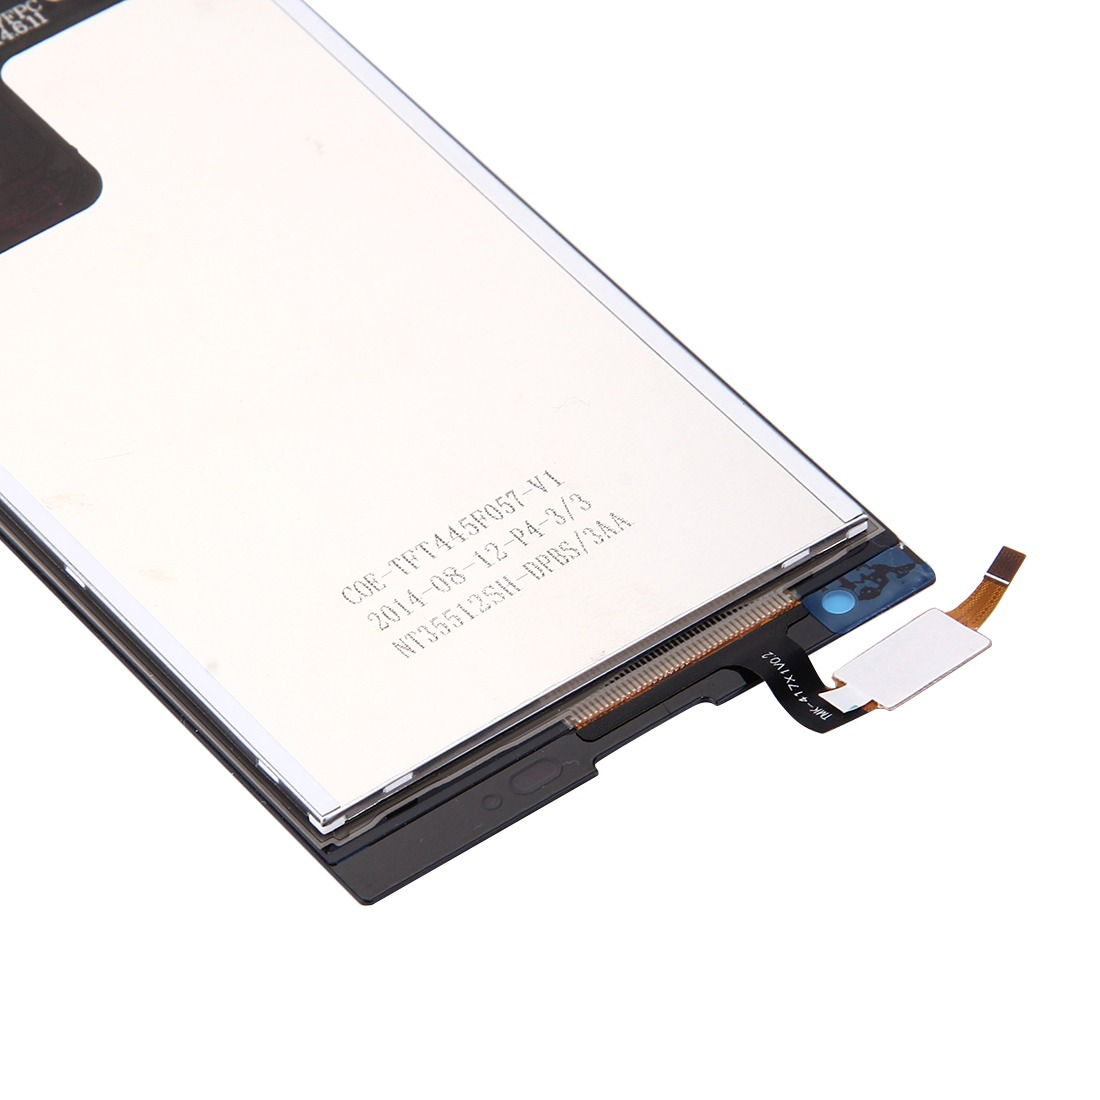 Blade Lux Kis 3 Max Pantalla Lcd V830w Tactil Digitalizador Zte Cargando Zoom